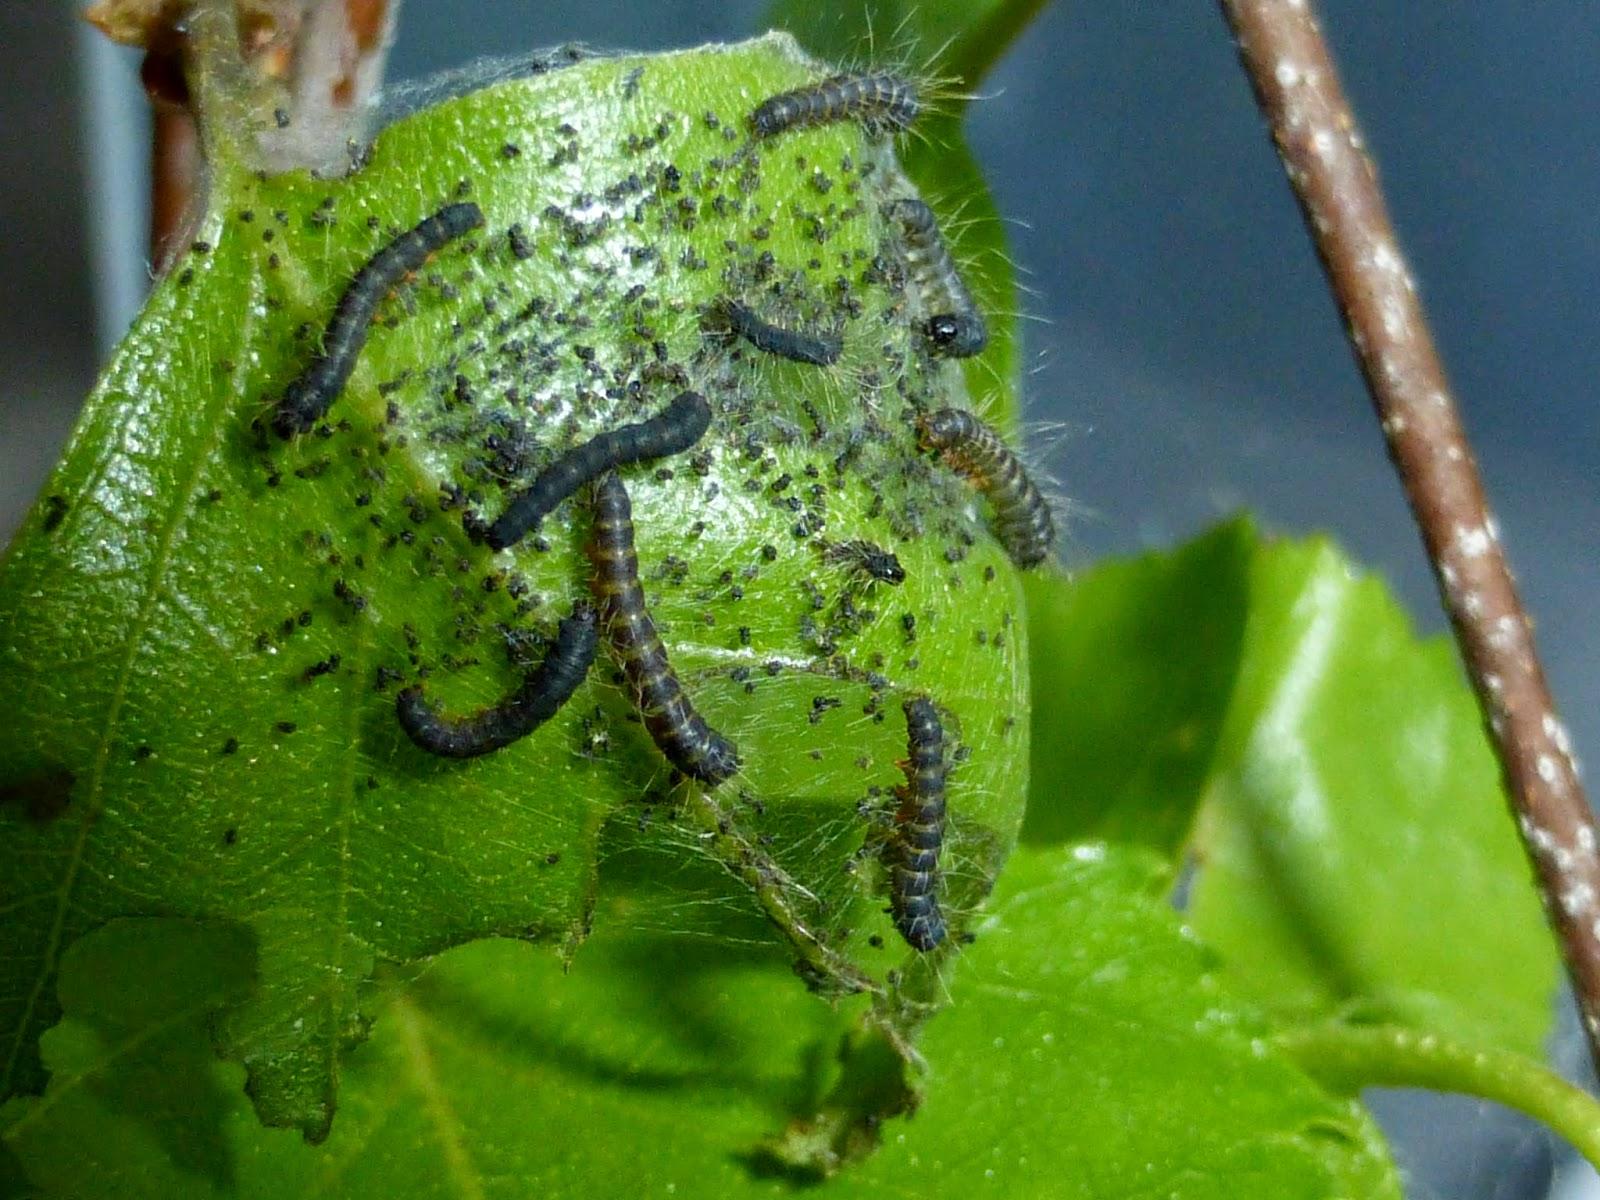 Eriogaster lanestris L2 caterpillars